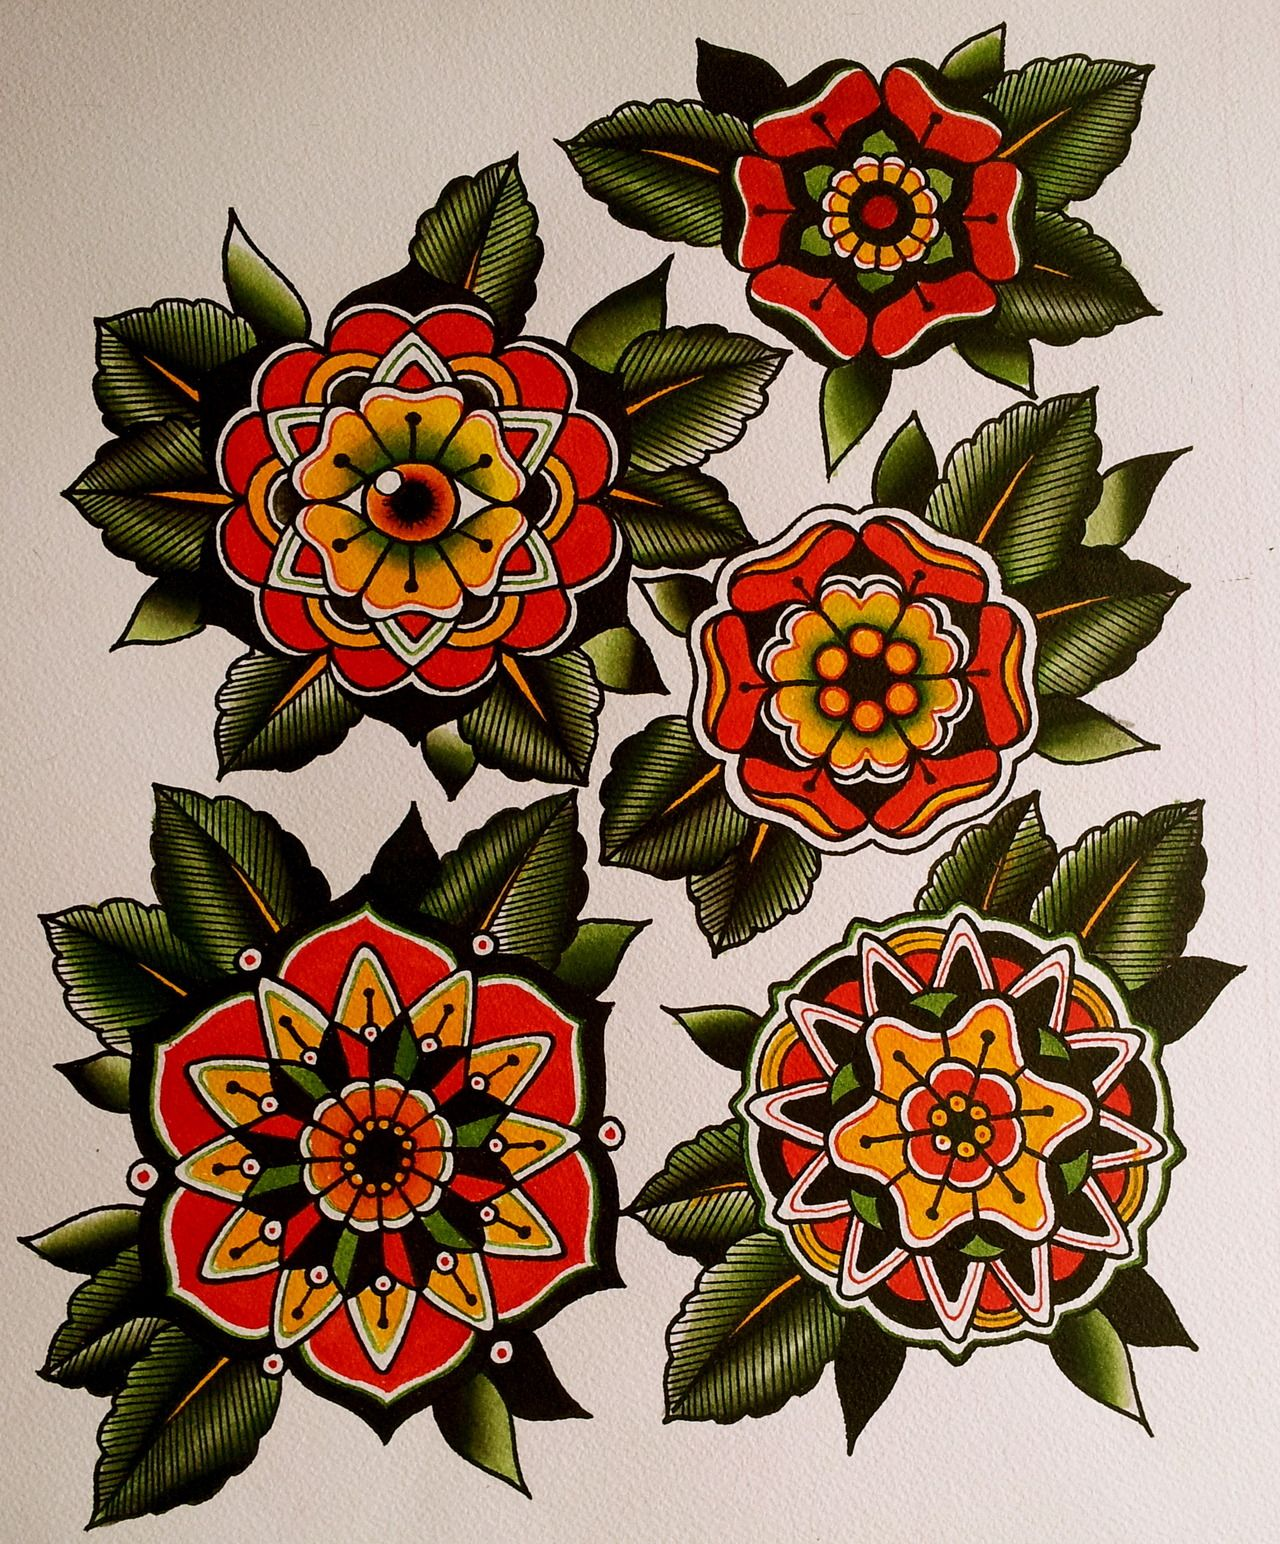 traditionalrawb mandala sheet I painted last night